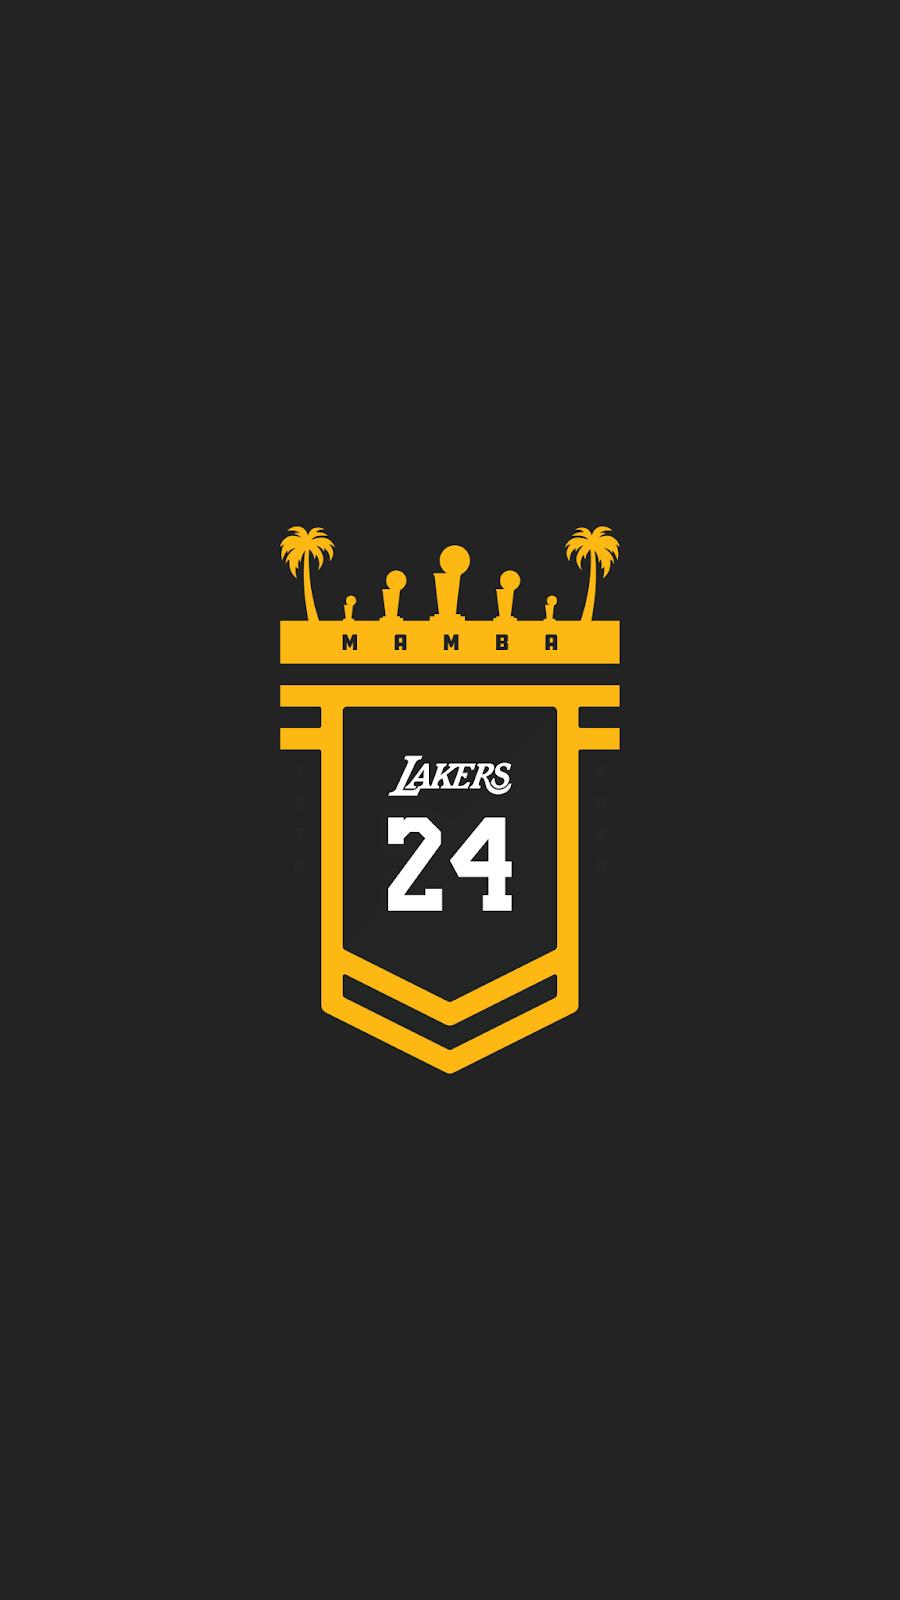 Kobe Bryant Cool Wallpapers For Phone In 2020 Kobe Bryant